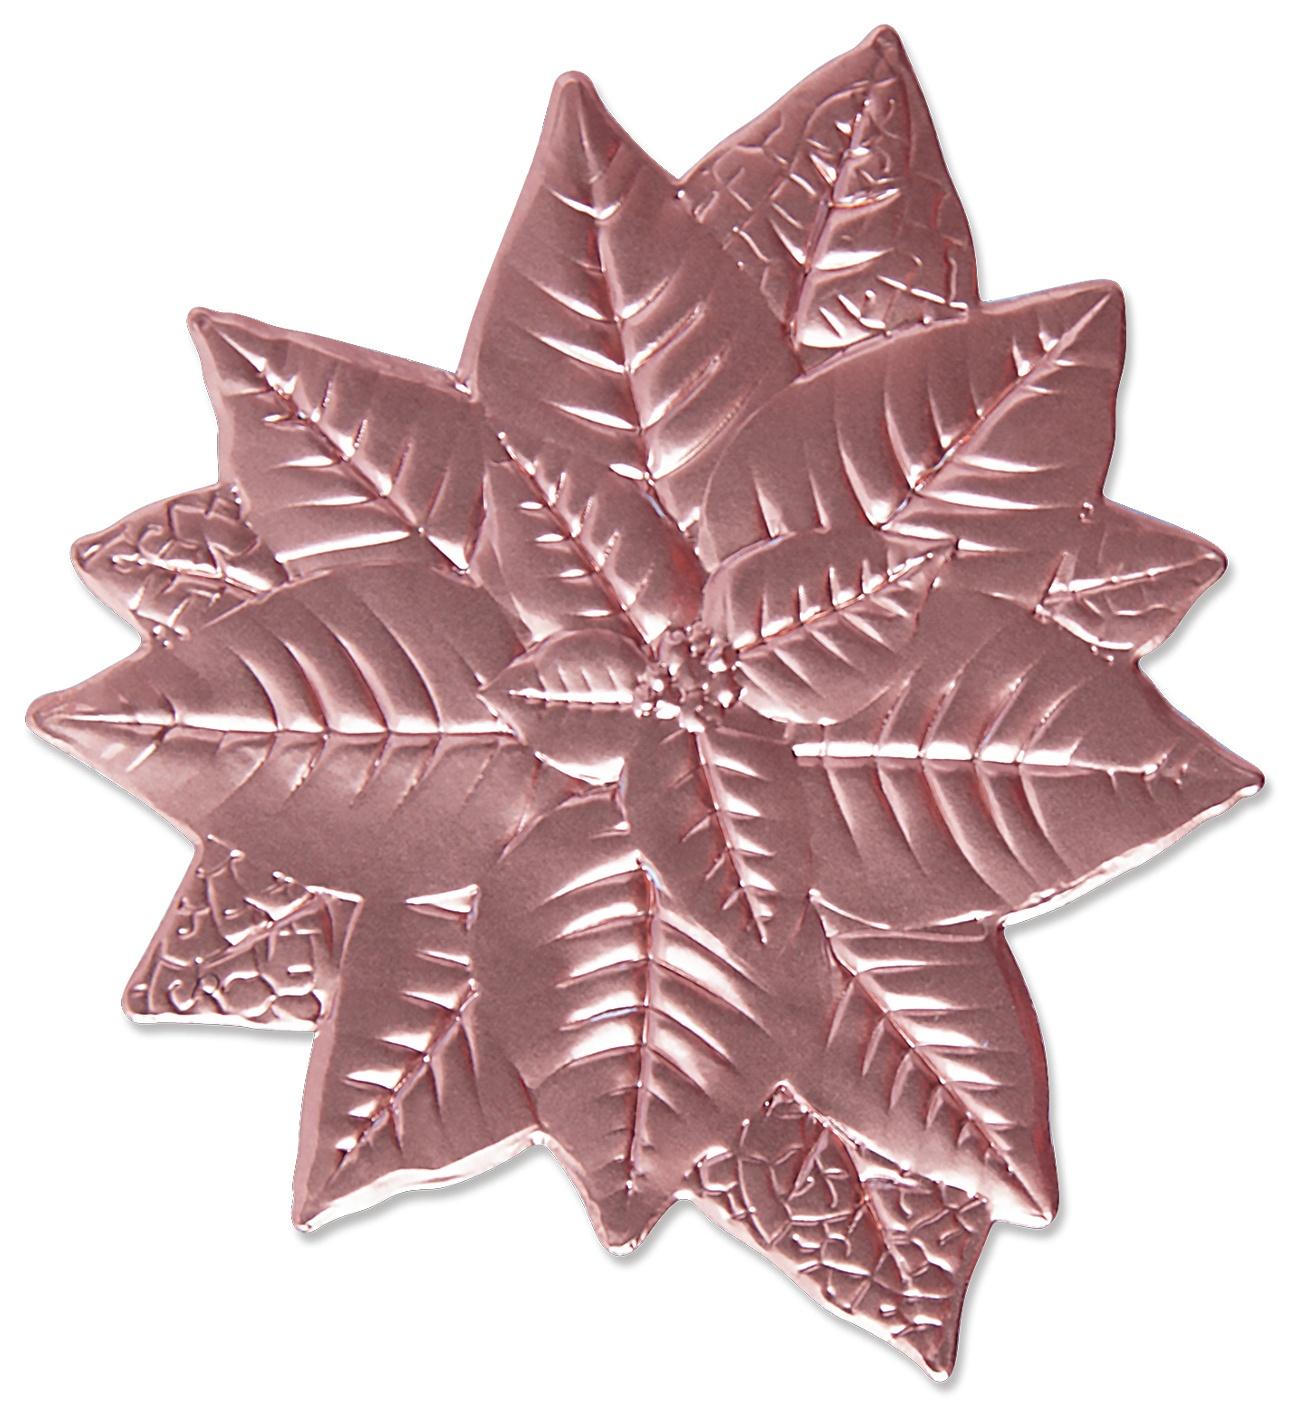 Sizzix - 3D Impresslits Embossing Folder - Poinsettia